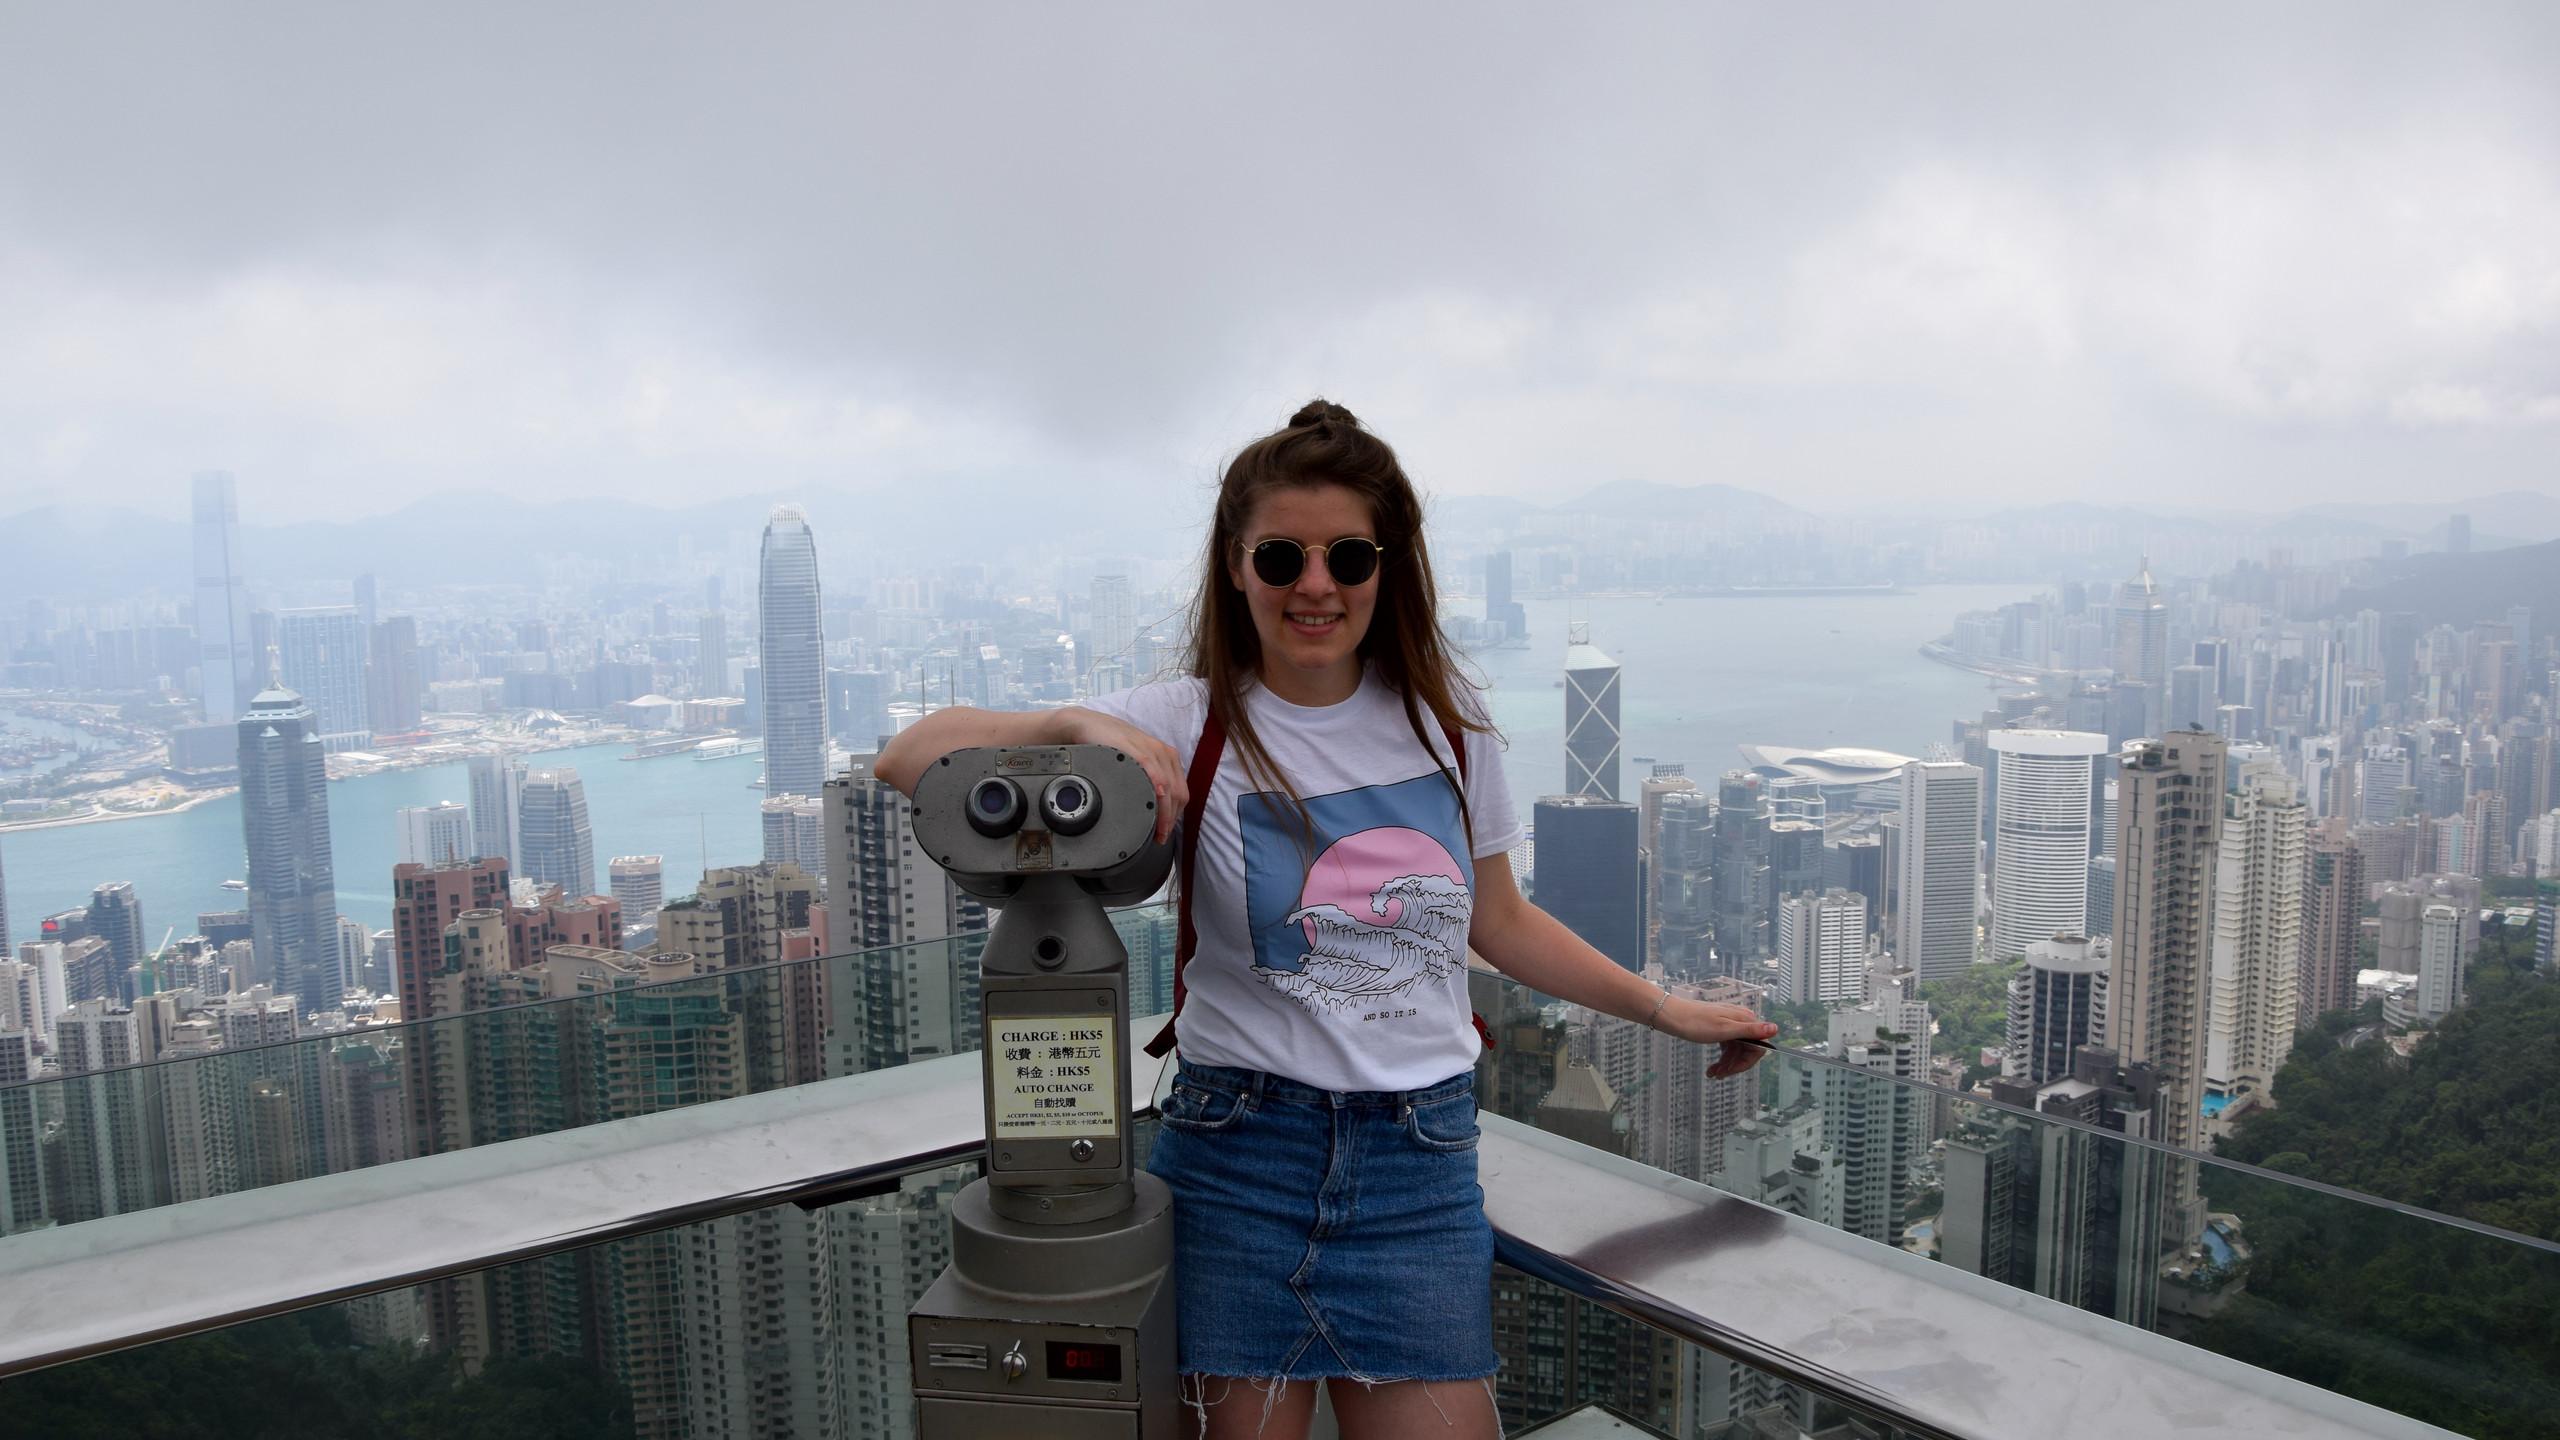 Hong Kong Victoria Peak Tower